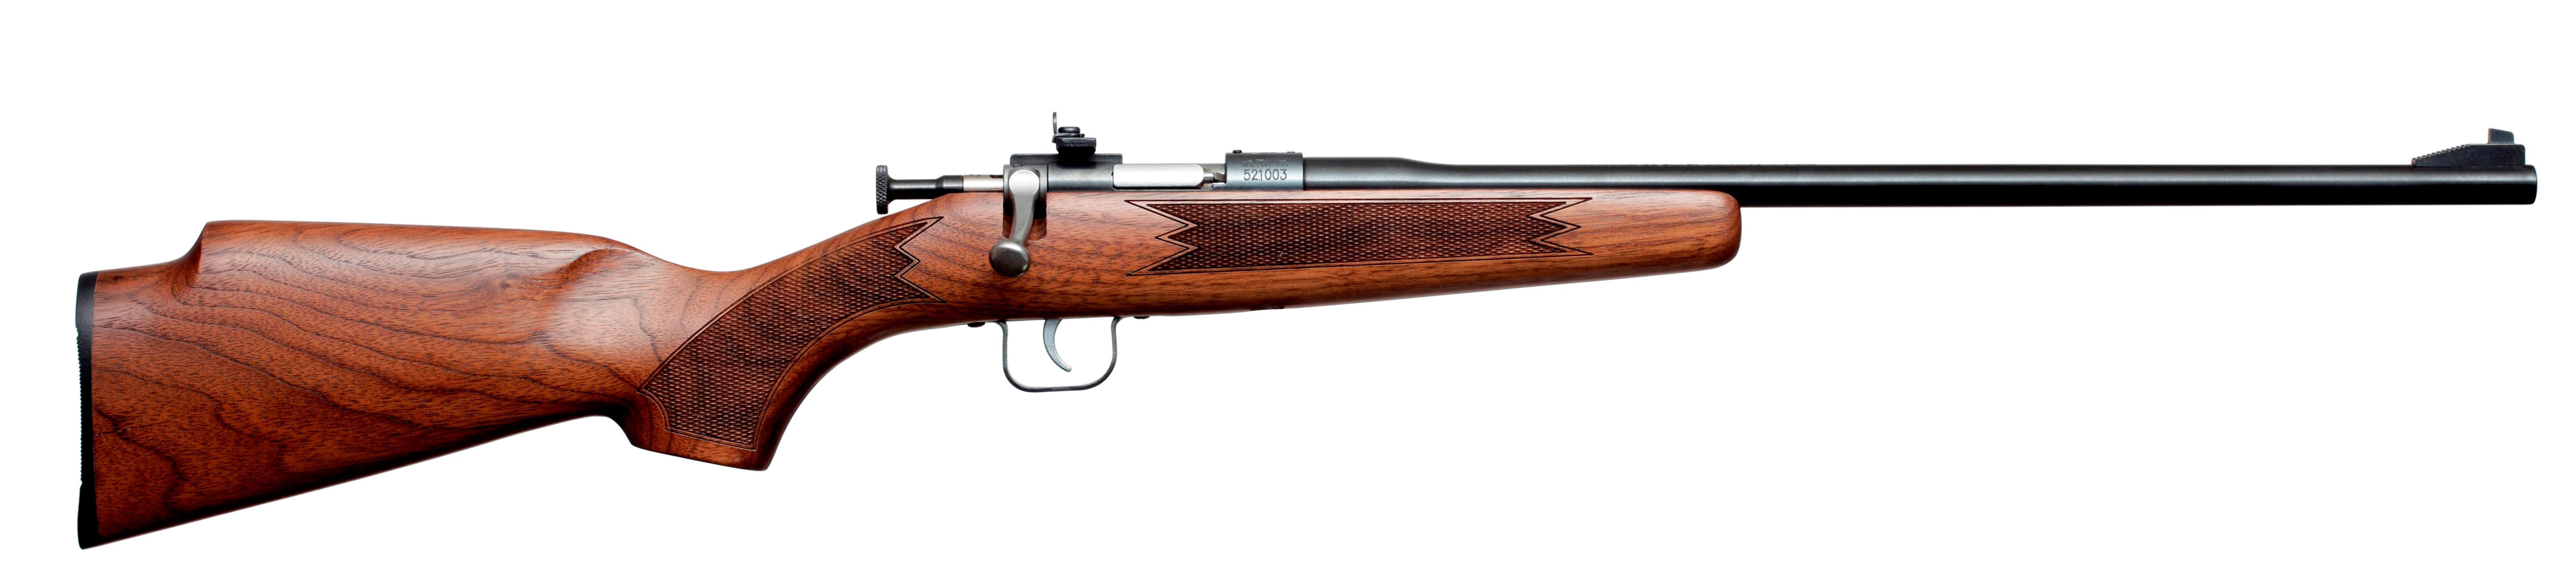 CHIPMUNK DELUXE 22LR BL/WALNUT - SINGLE-SHOT